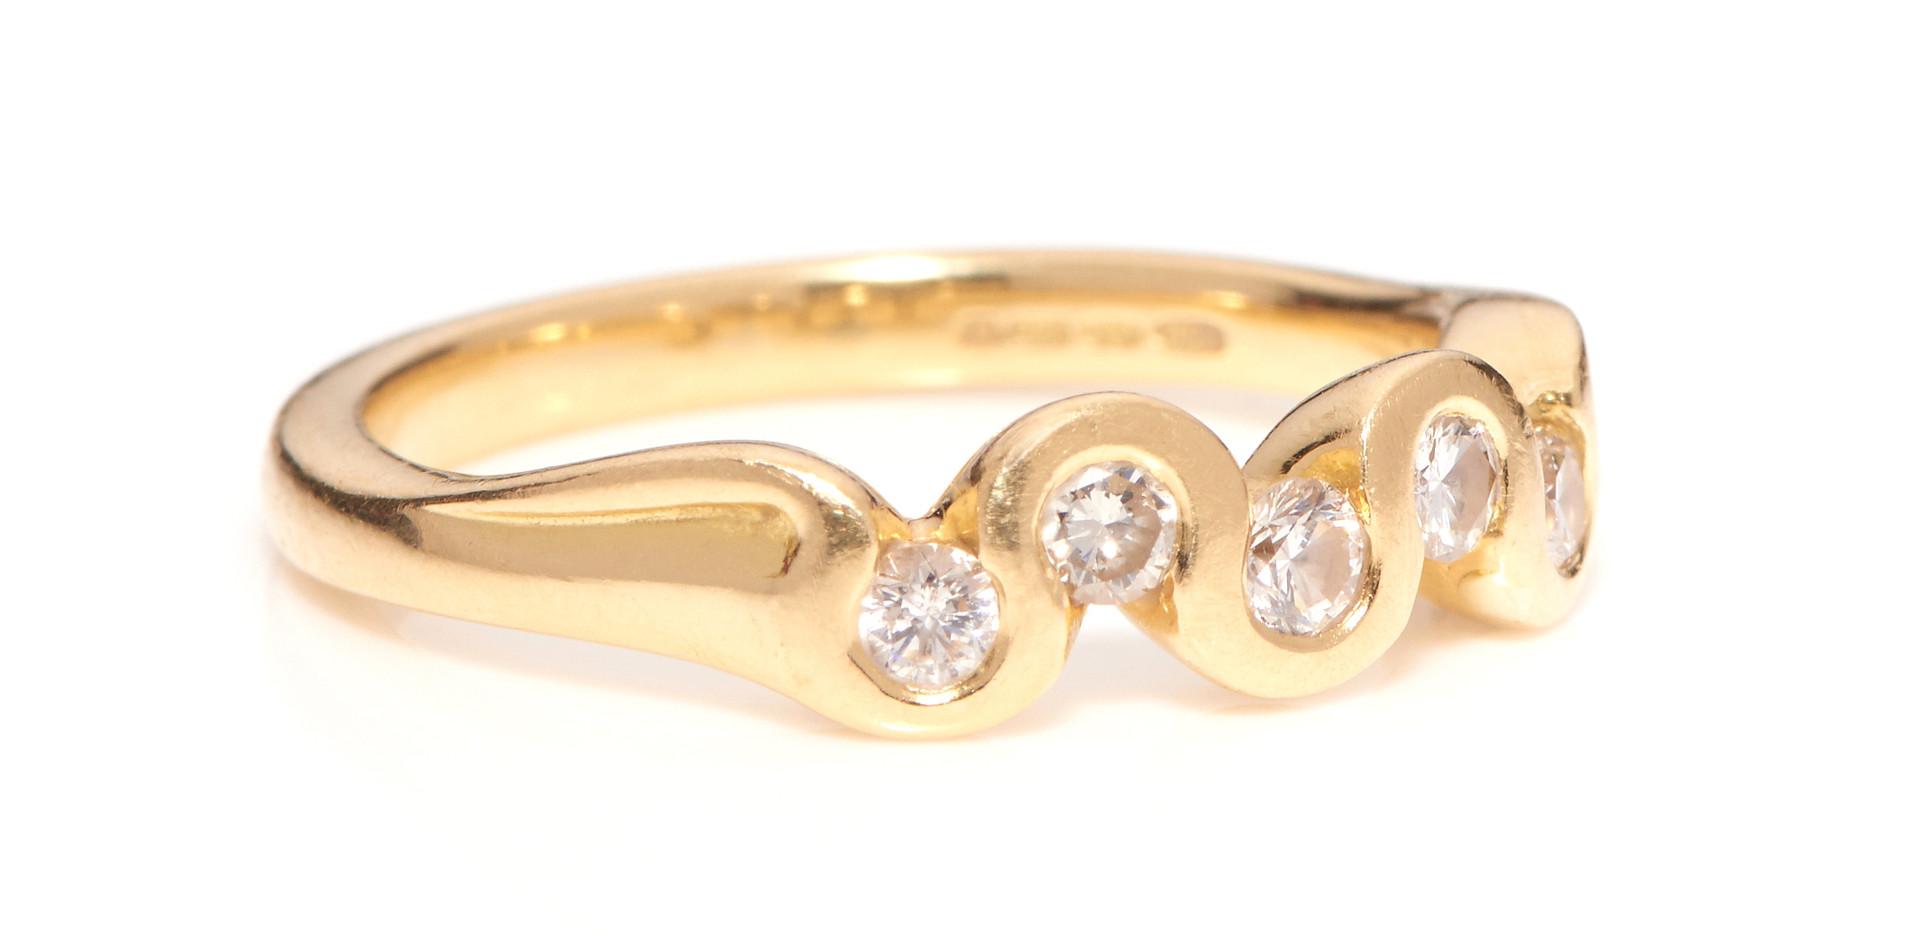 Ring on White